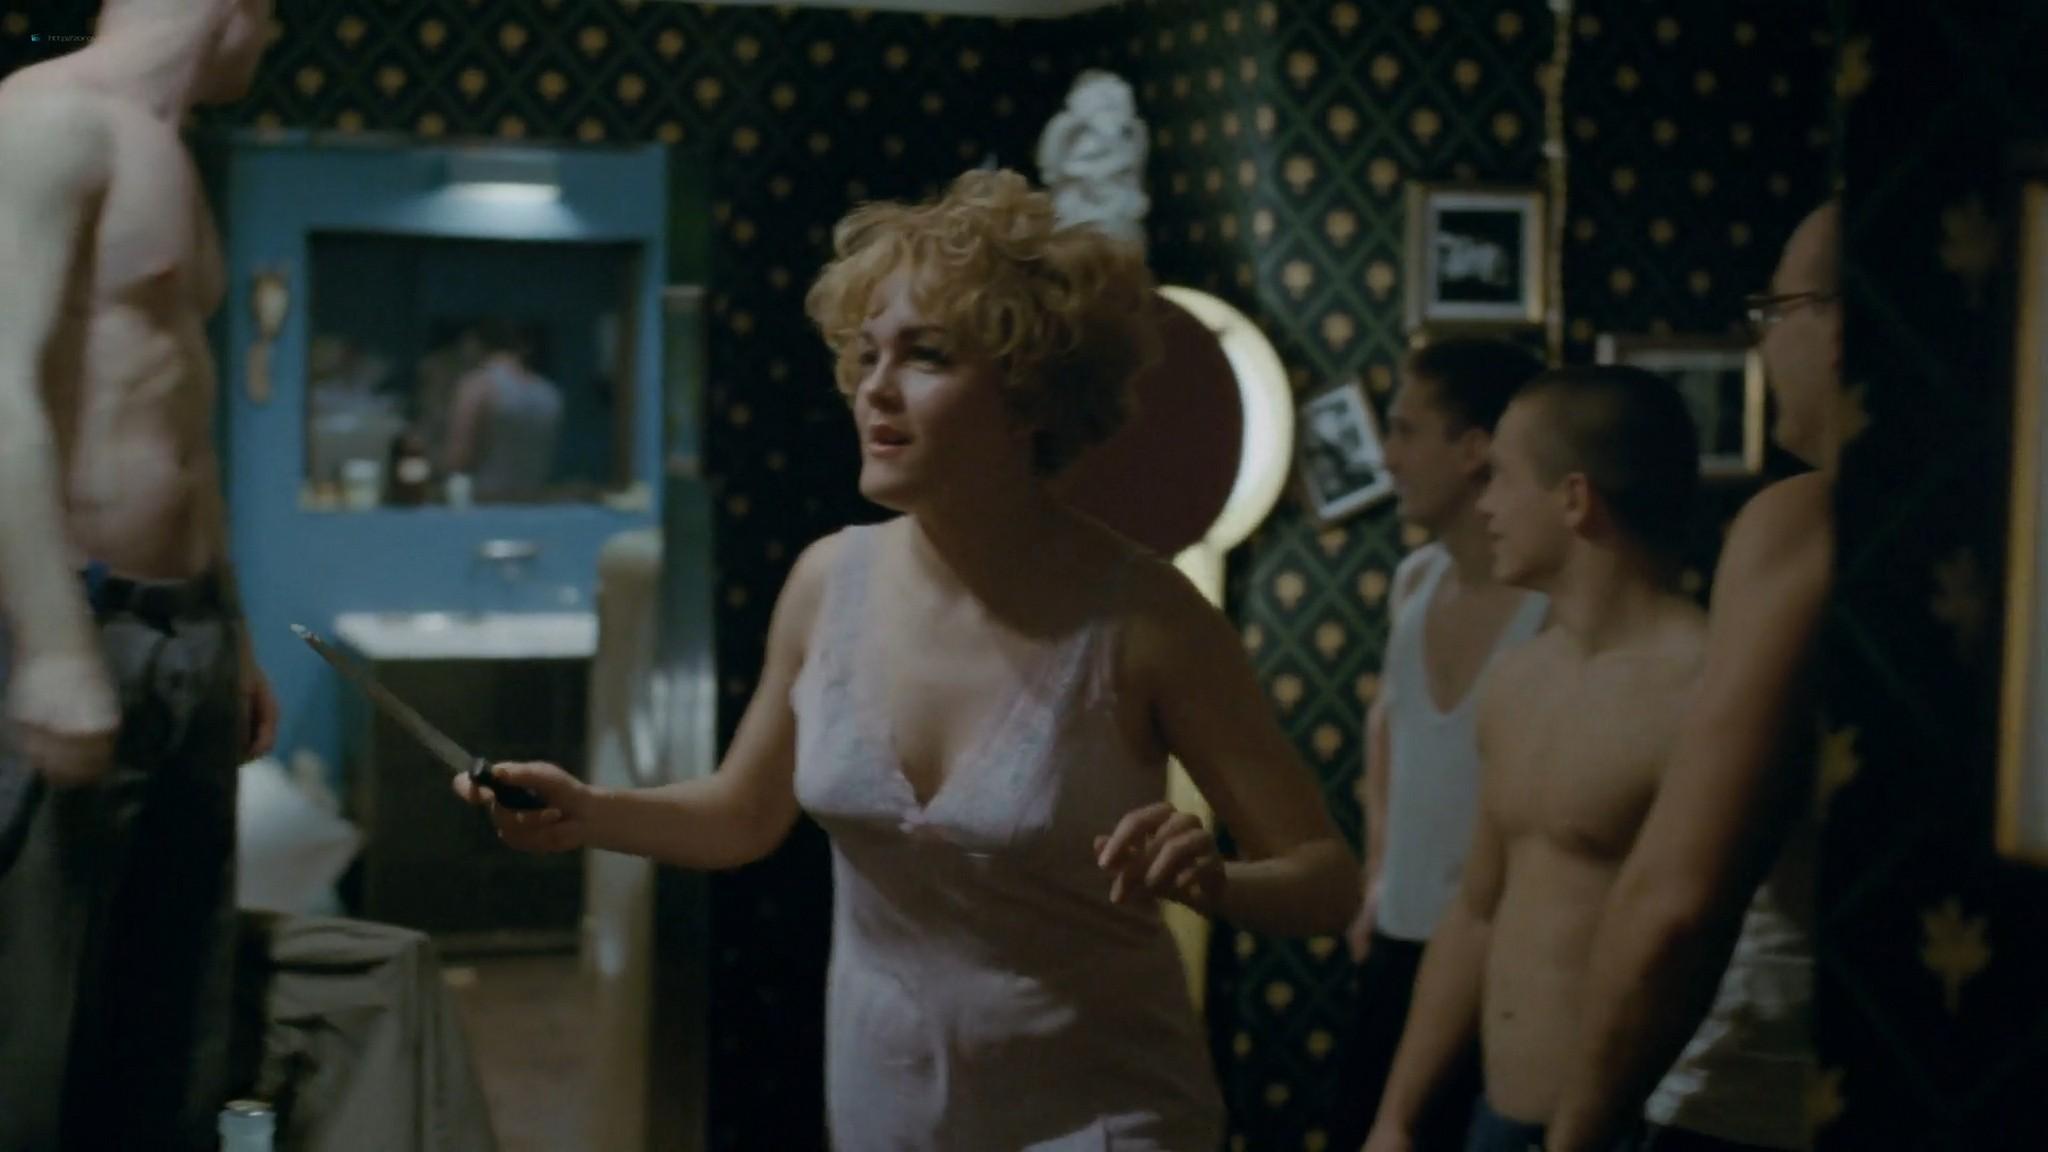 Kristina Babich nude sex Viktoria Skitskaya, Kristina Voloshina nude too- DAU Degeneratsiya (2020) HD 1080p (3)